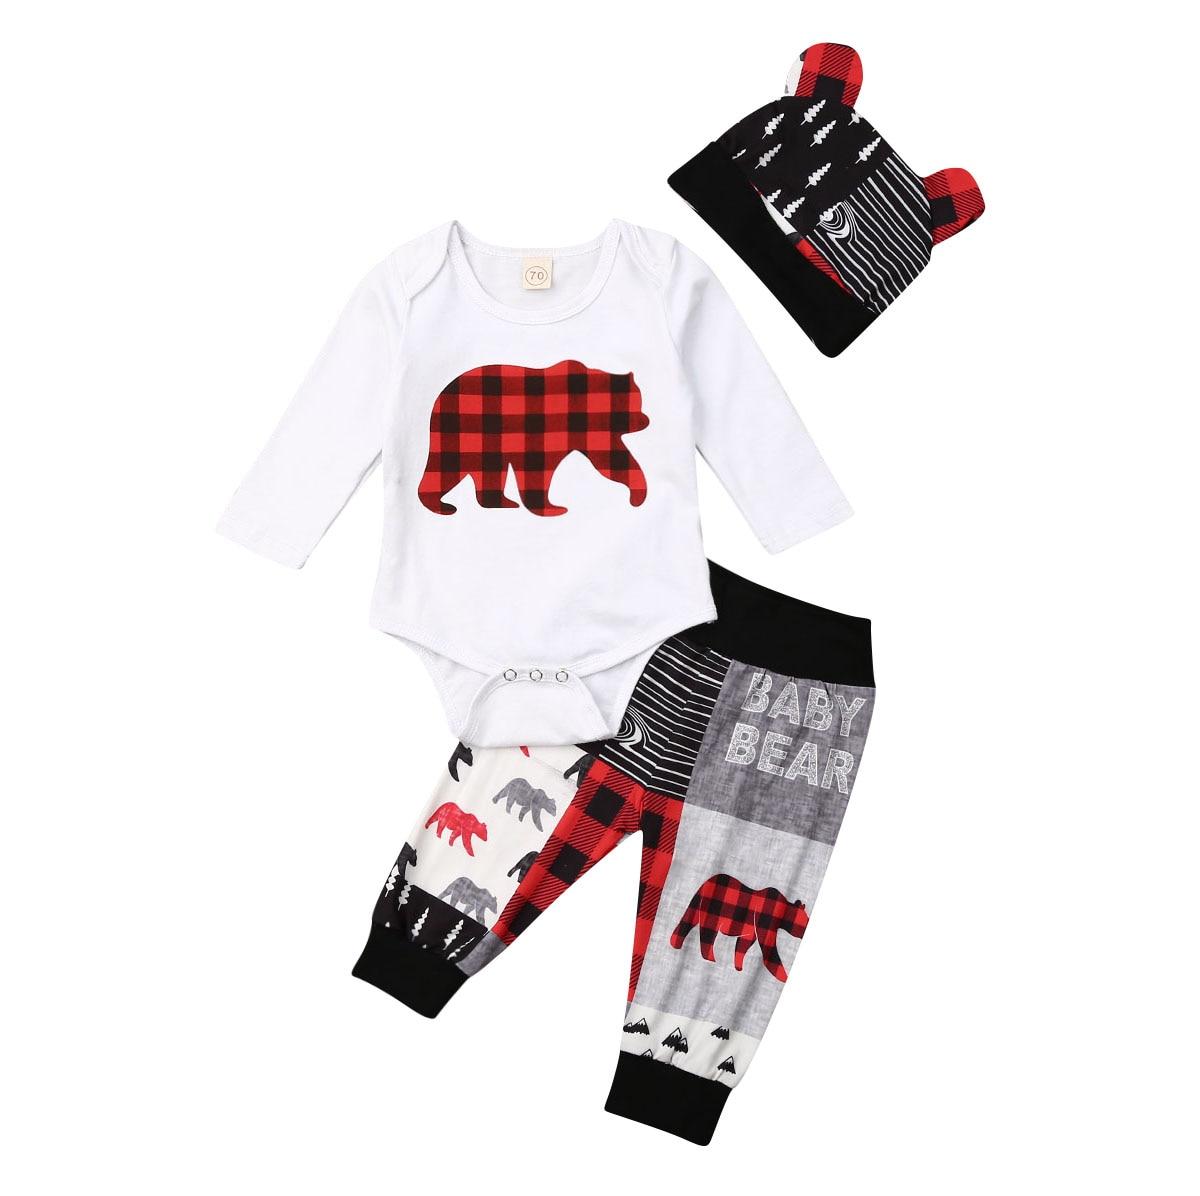 Autumn Winter 3PCS Newborn Baby Boy Girl Christmas Clothes Set Bear Print Romper Pants Bear Ear Hats Lovely Outfits 0-24M